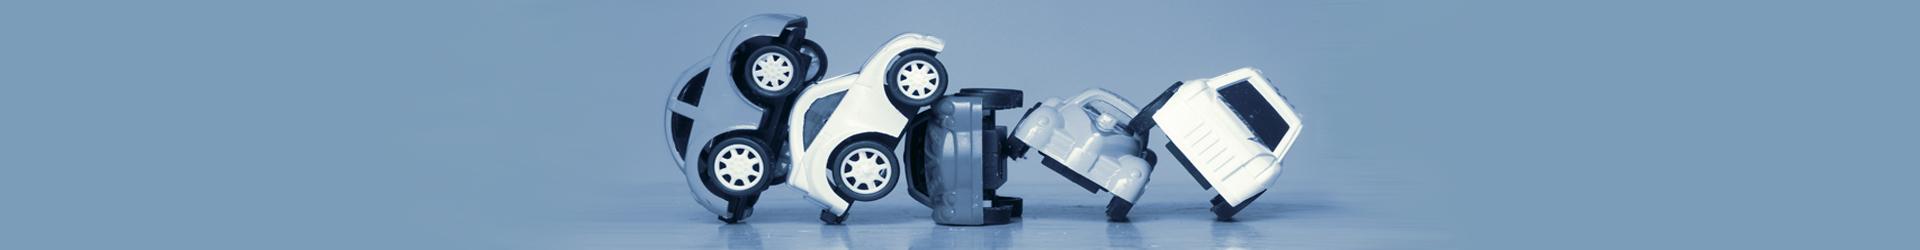 goedkope auto verzekering